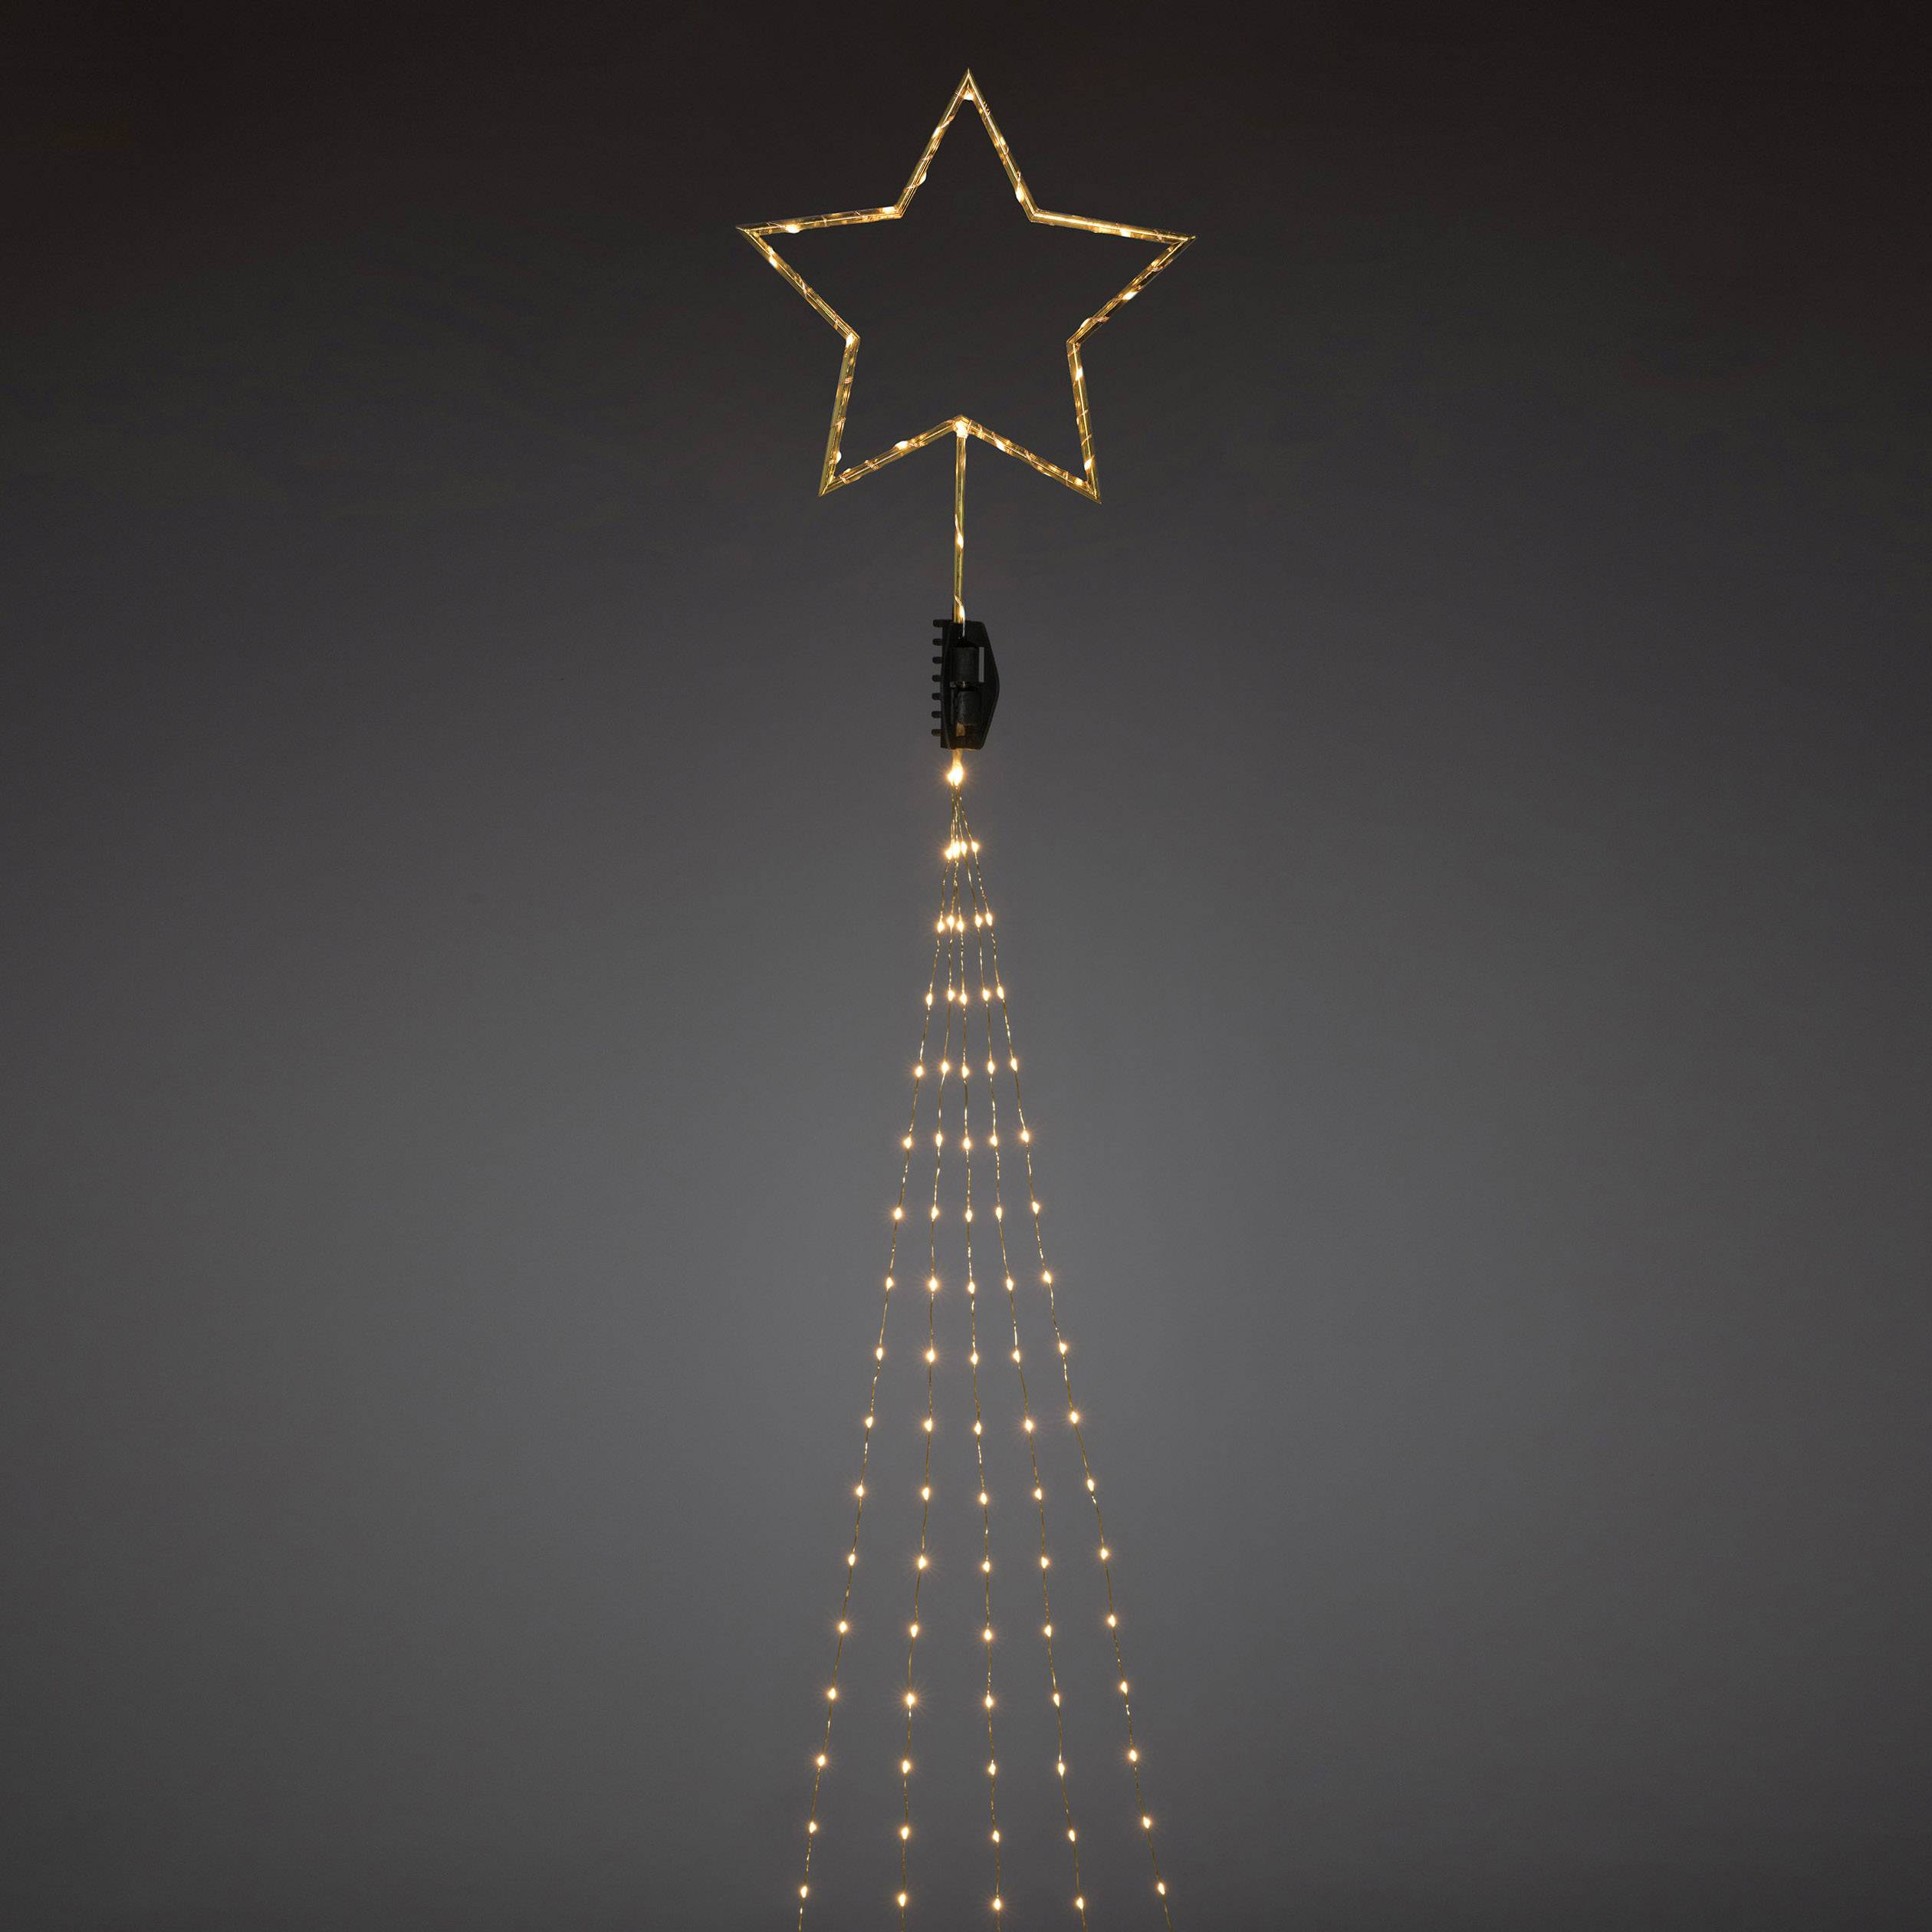 led boommantel ster binnen werkt op het lichtnet 308 led amber verlichte lengte 235 m konstsmide 6315 860